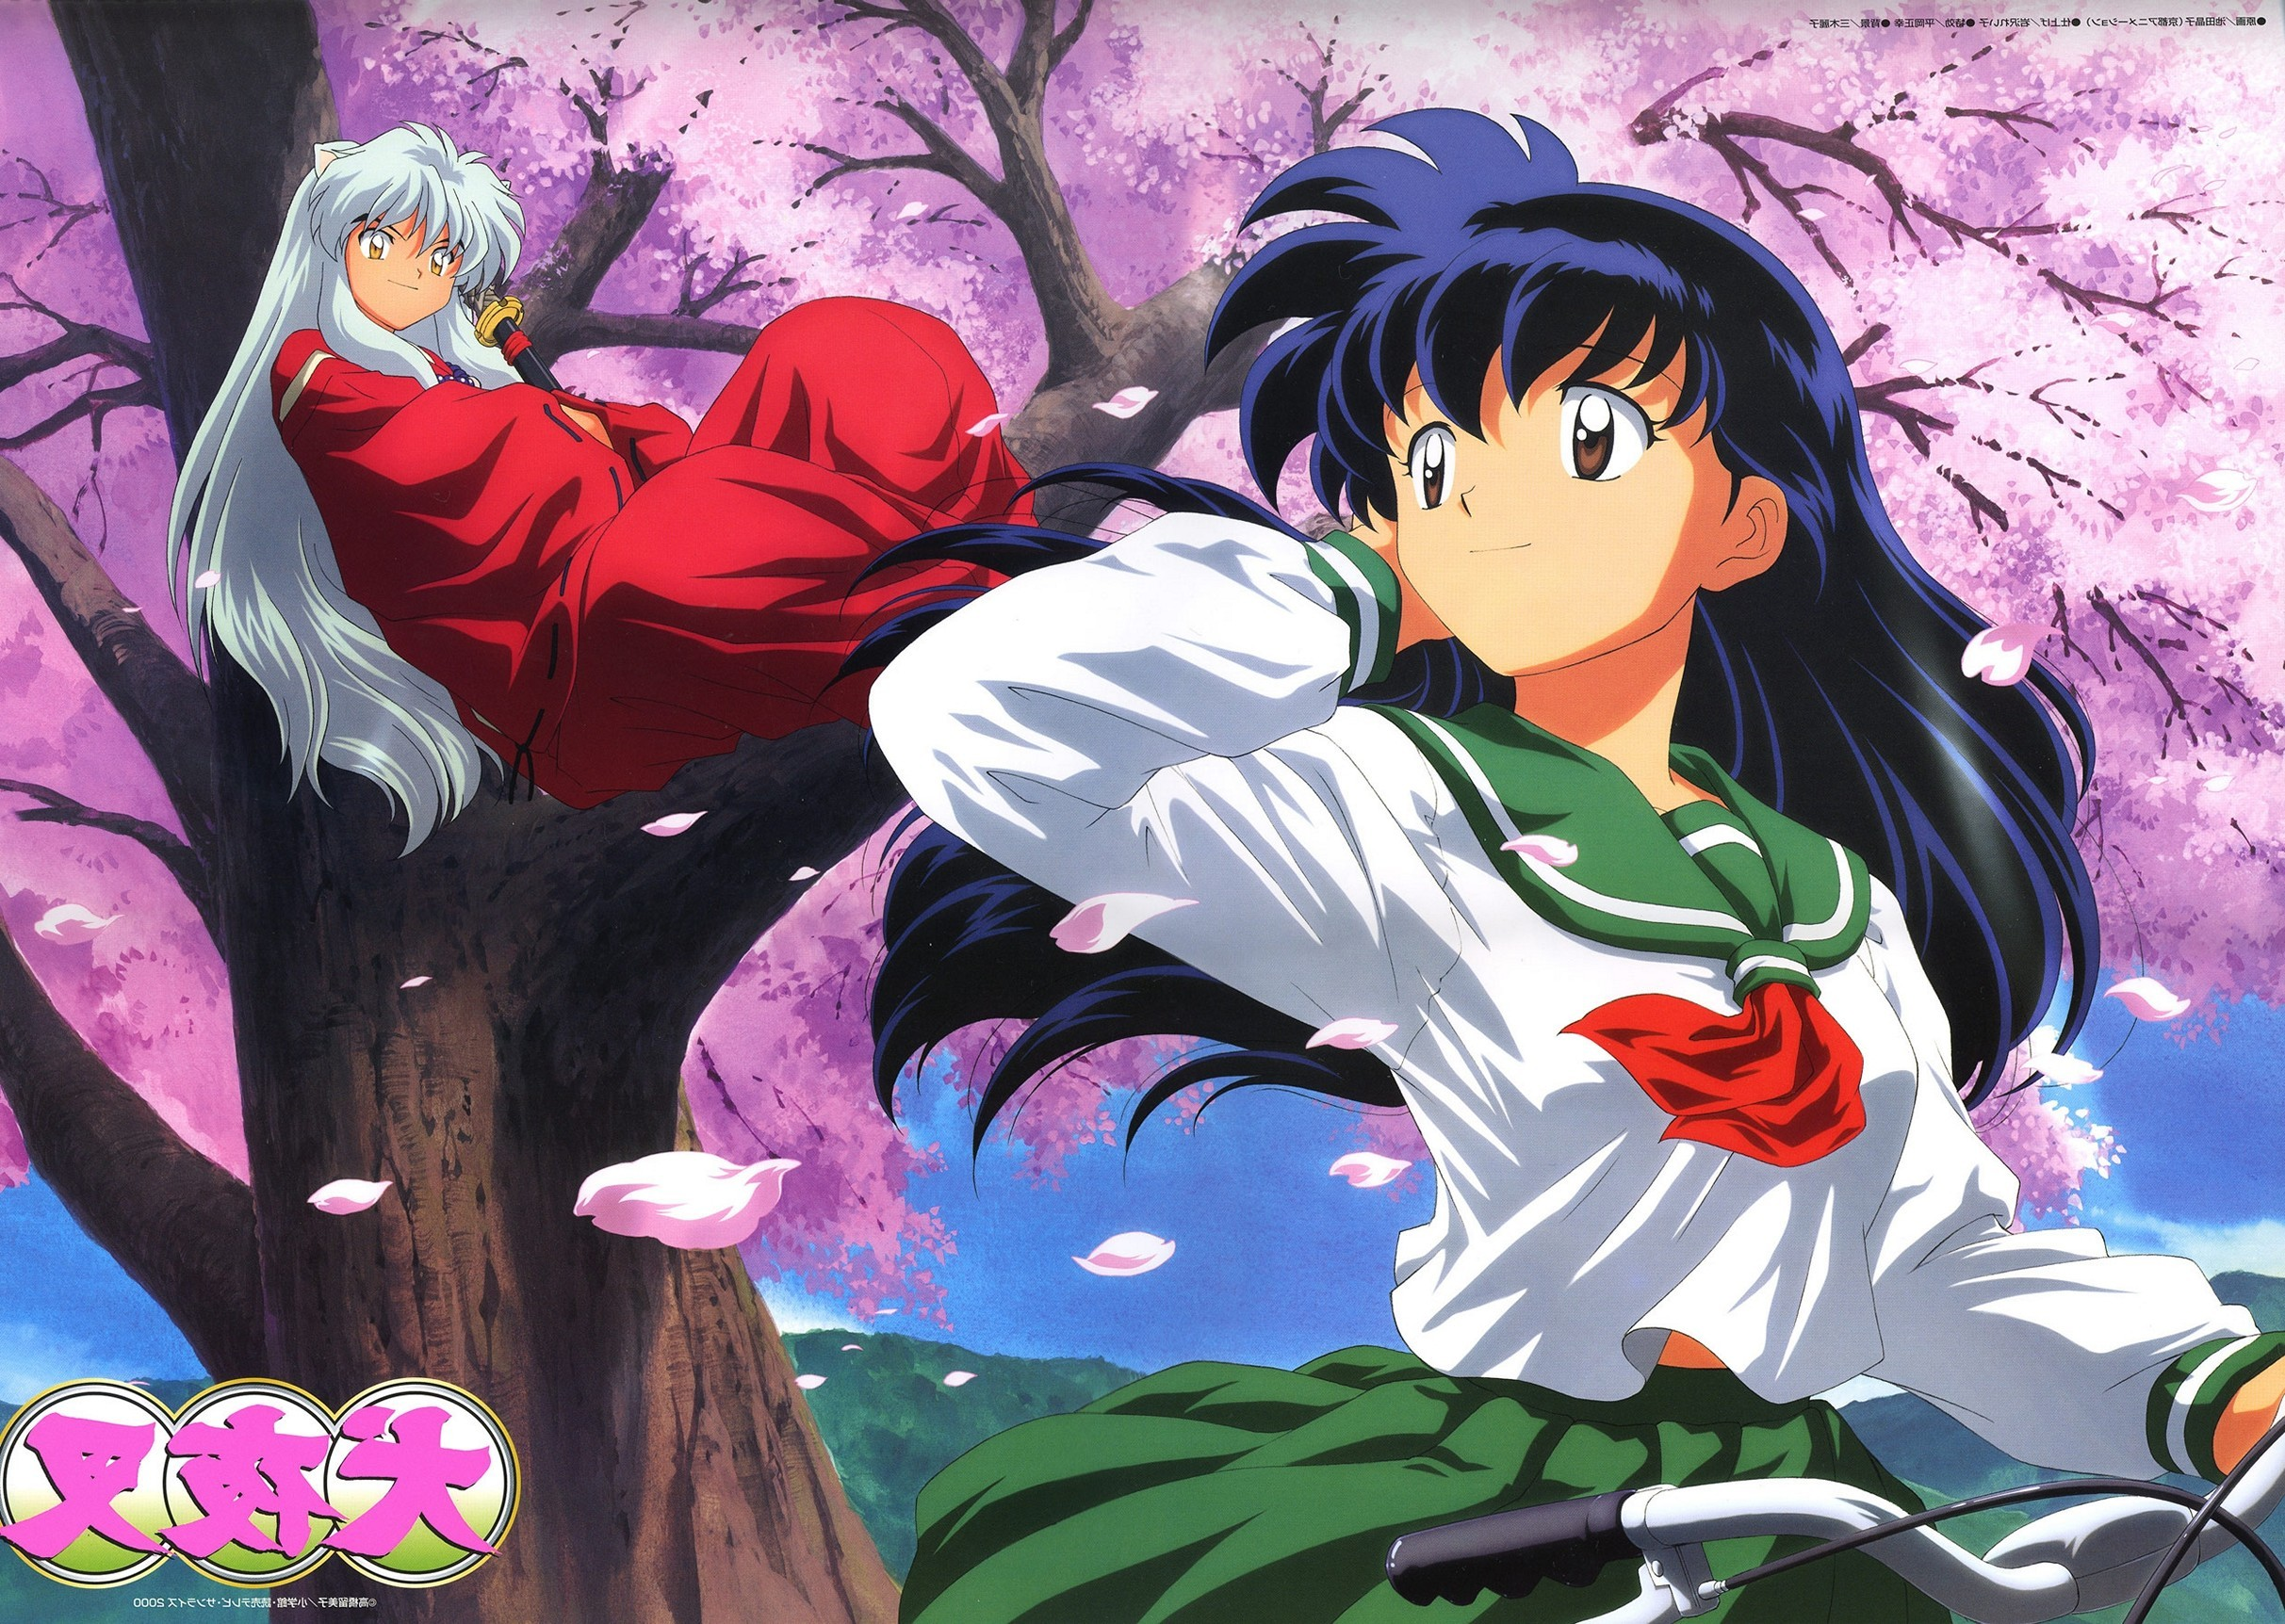 Higurashi Kagome Inuyash Top Anime Wallpaper Phone